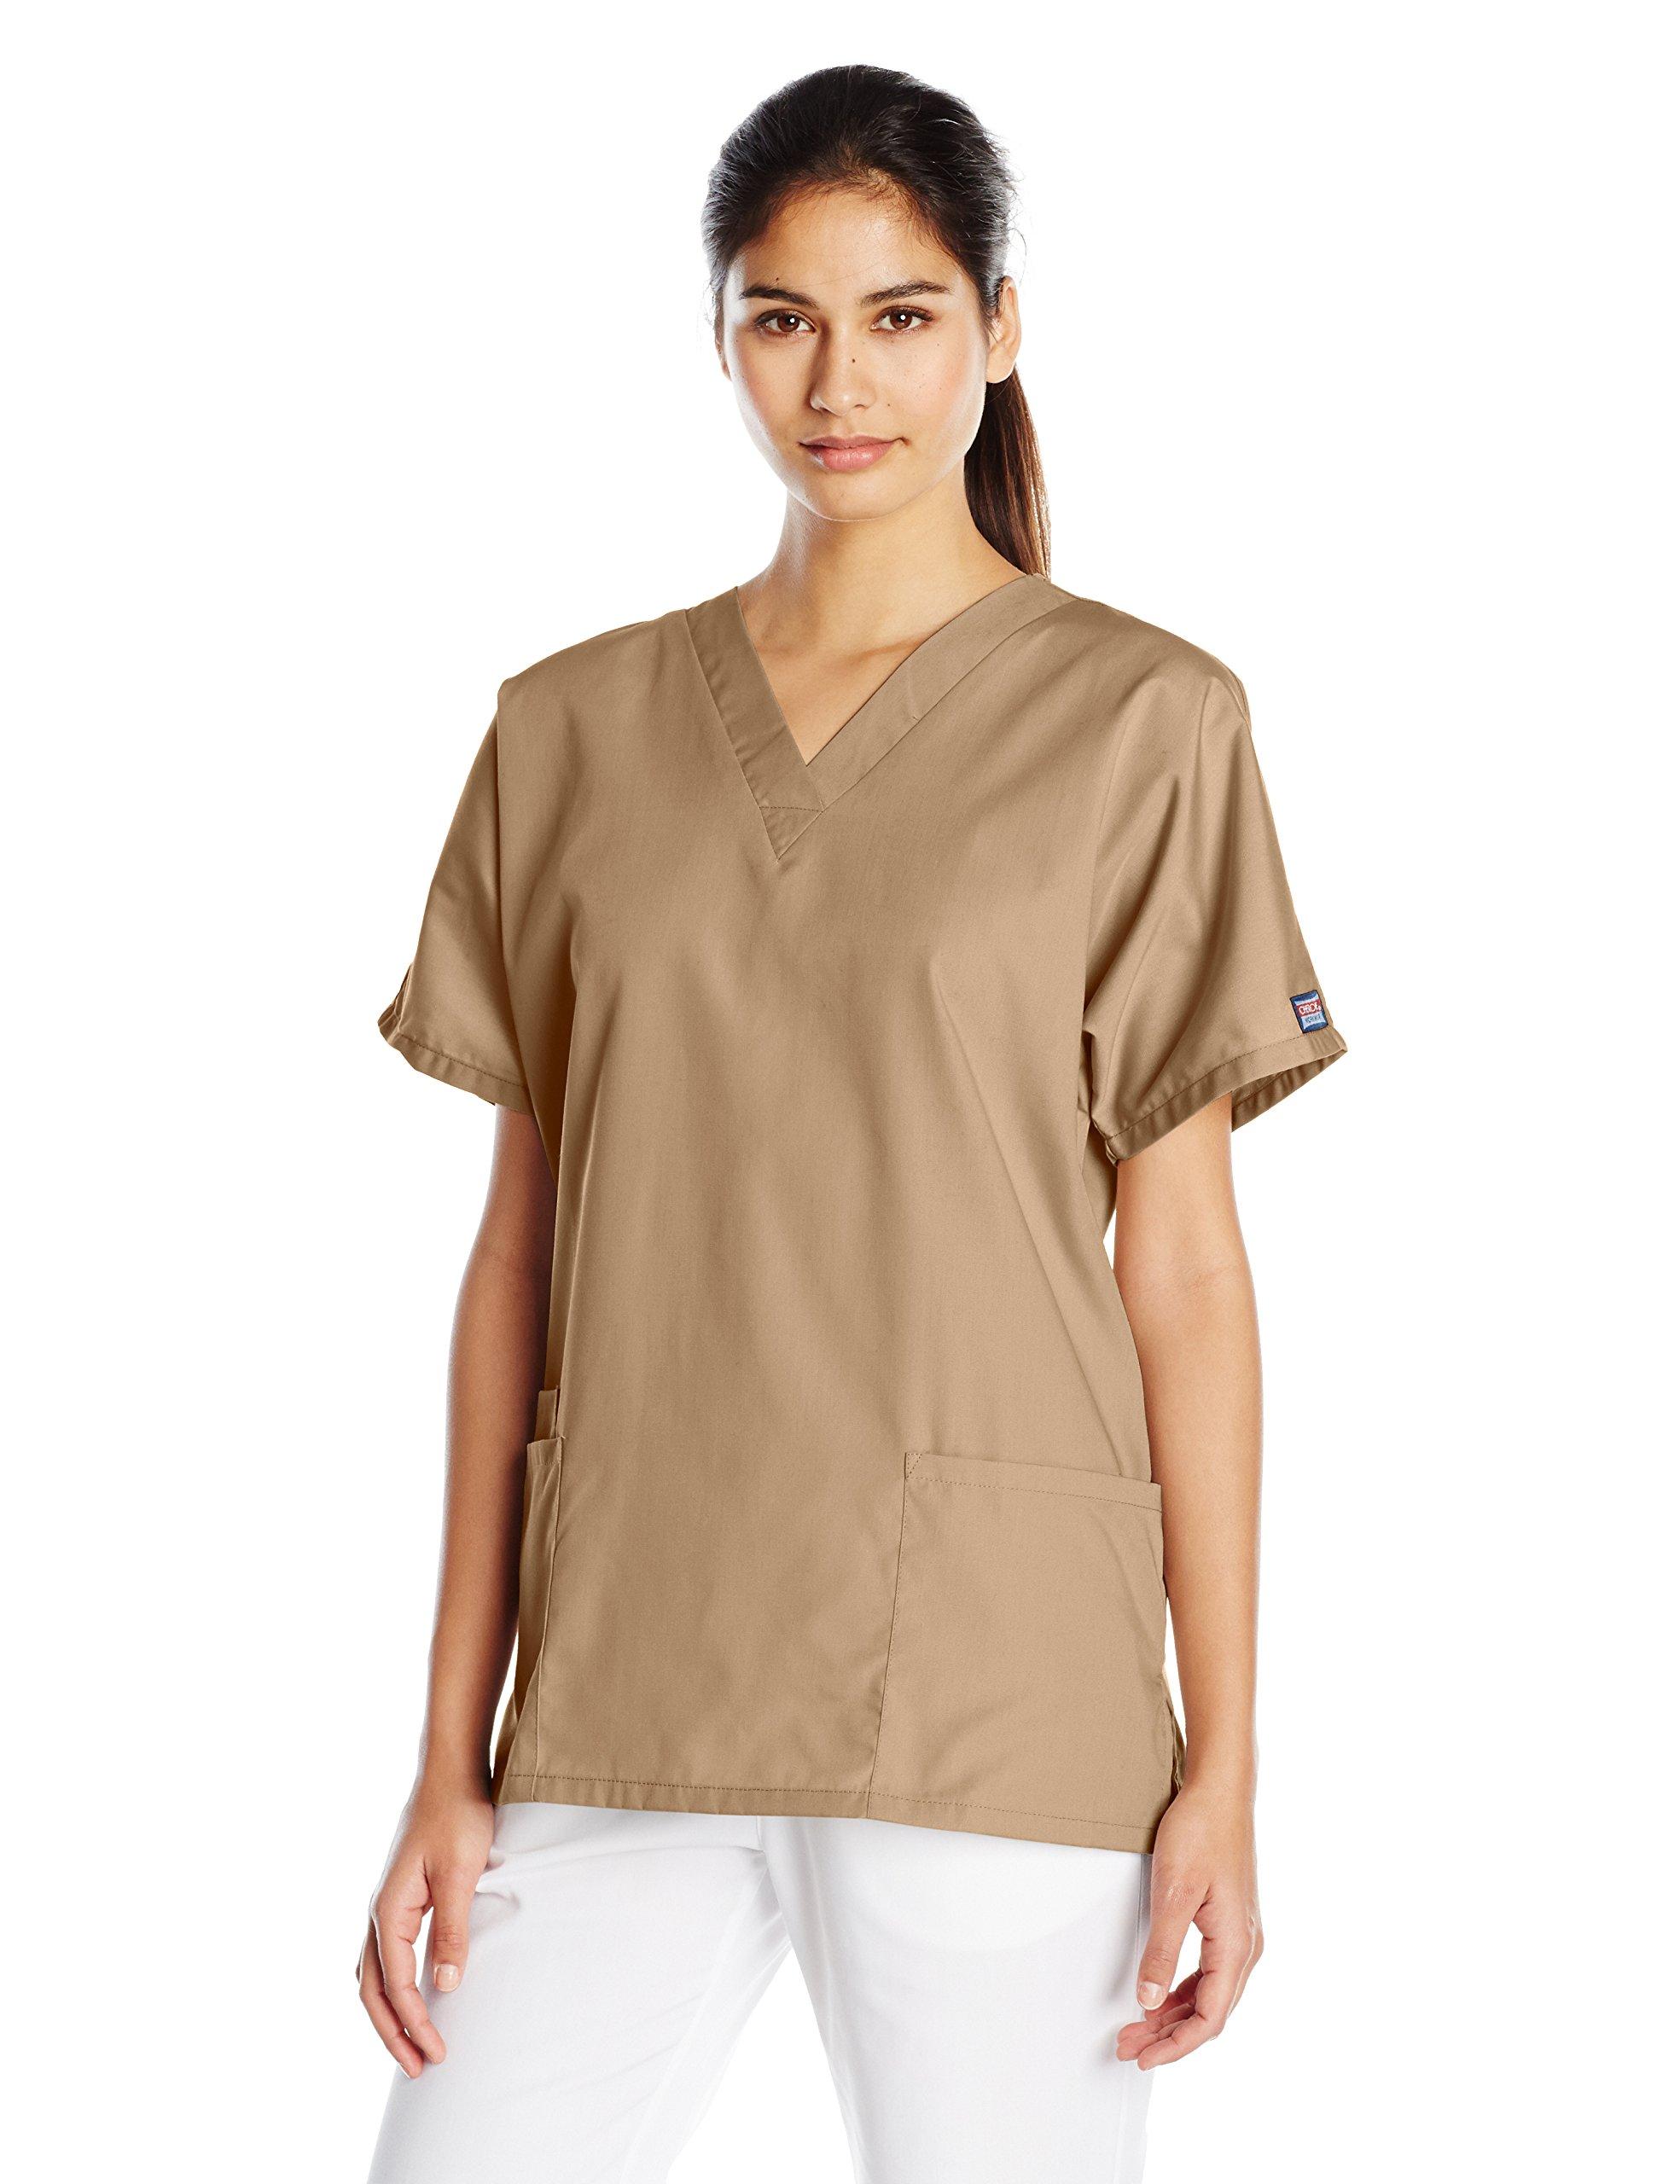 Cherokee Women's V-Neck Scrub Top, Dark Khaki, Medium